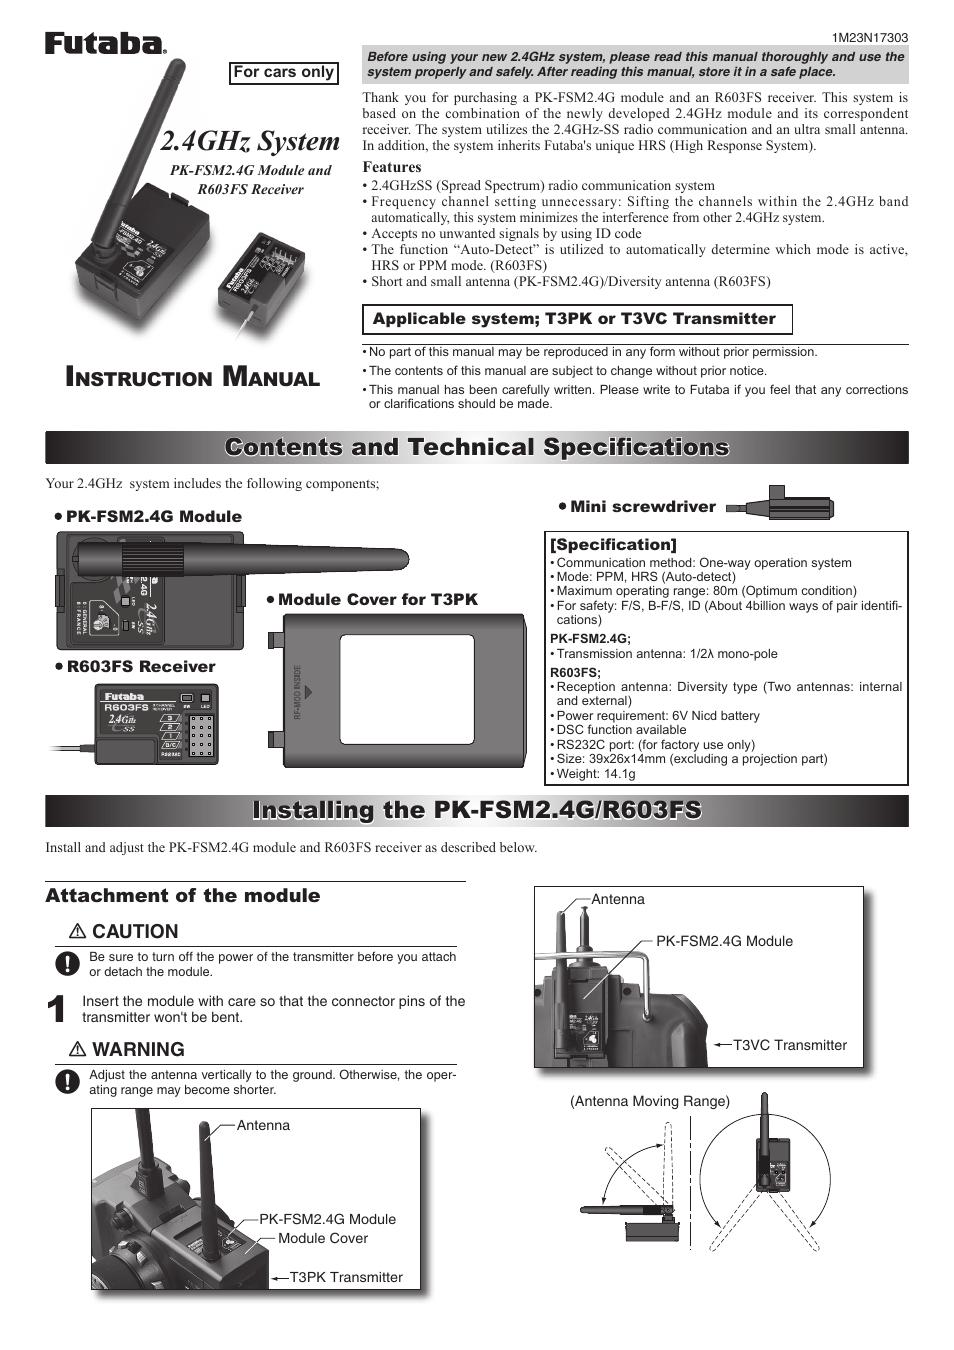 FUTABA 3PK MANUAL PDF